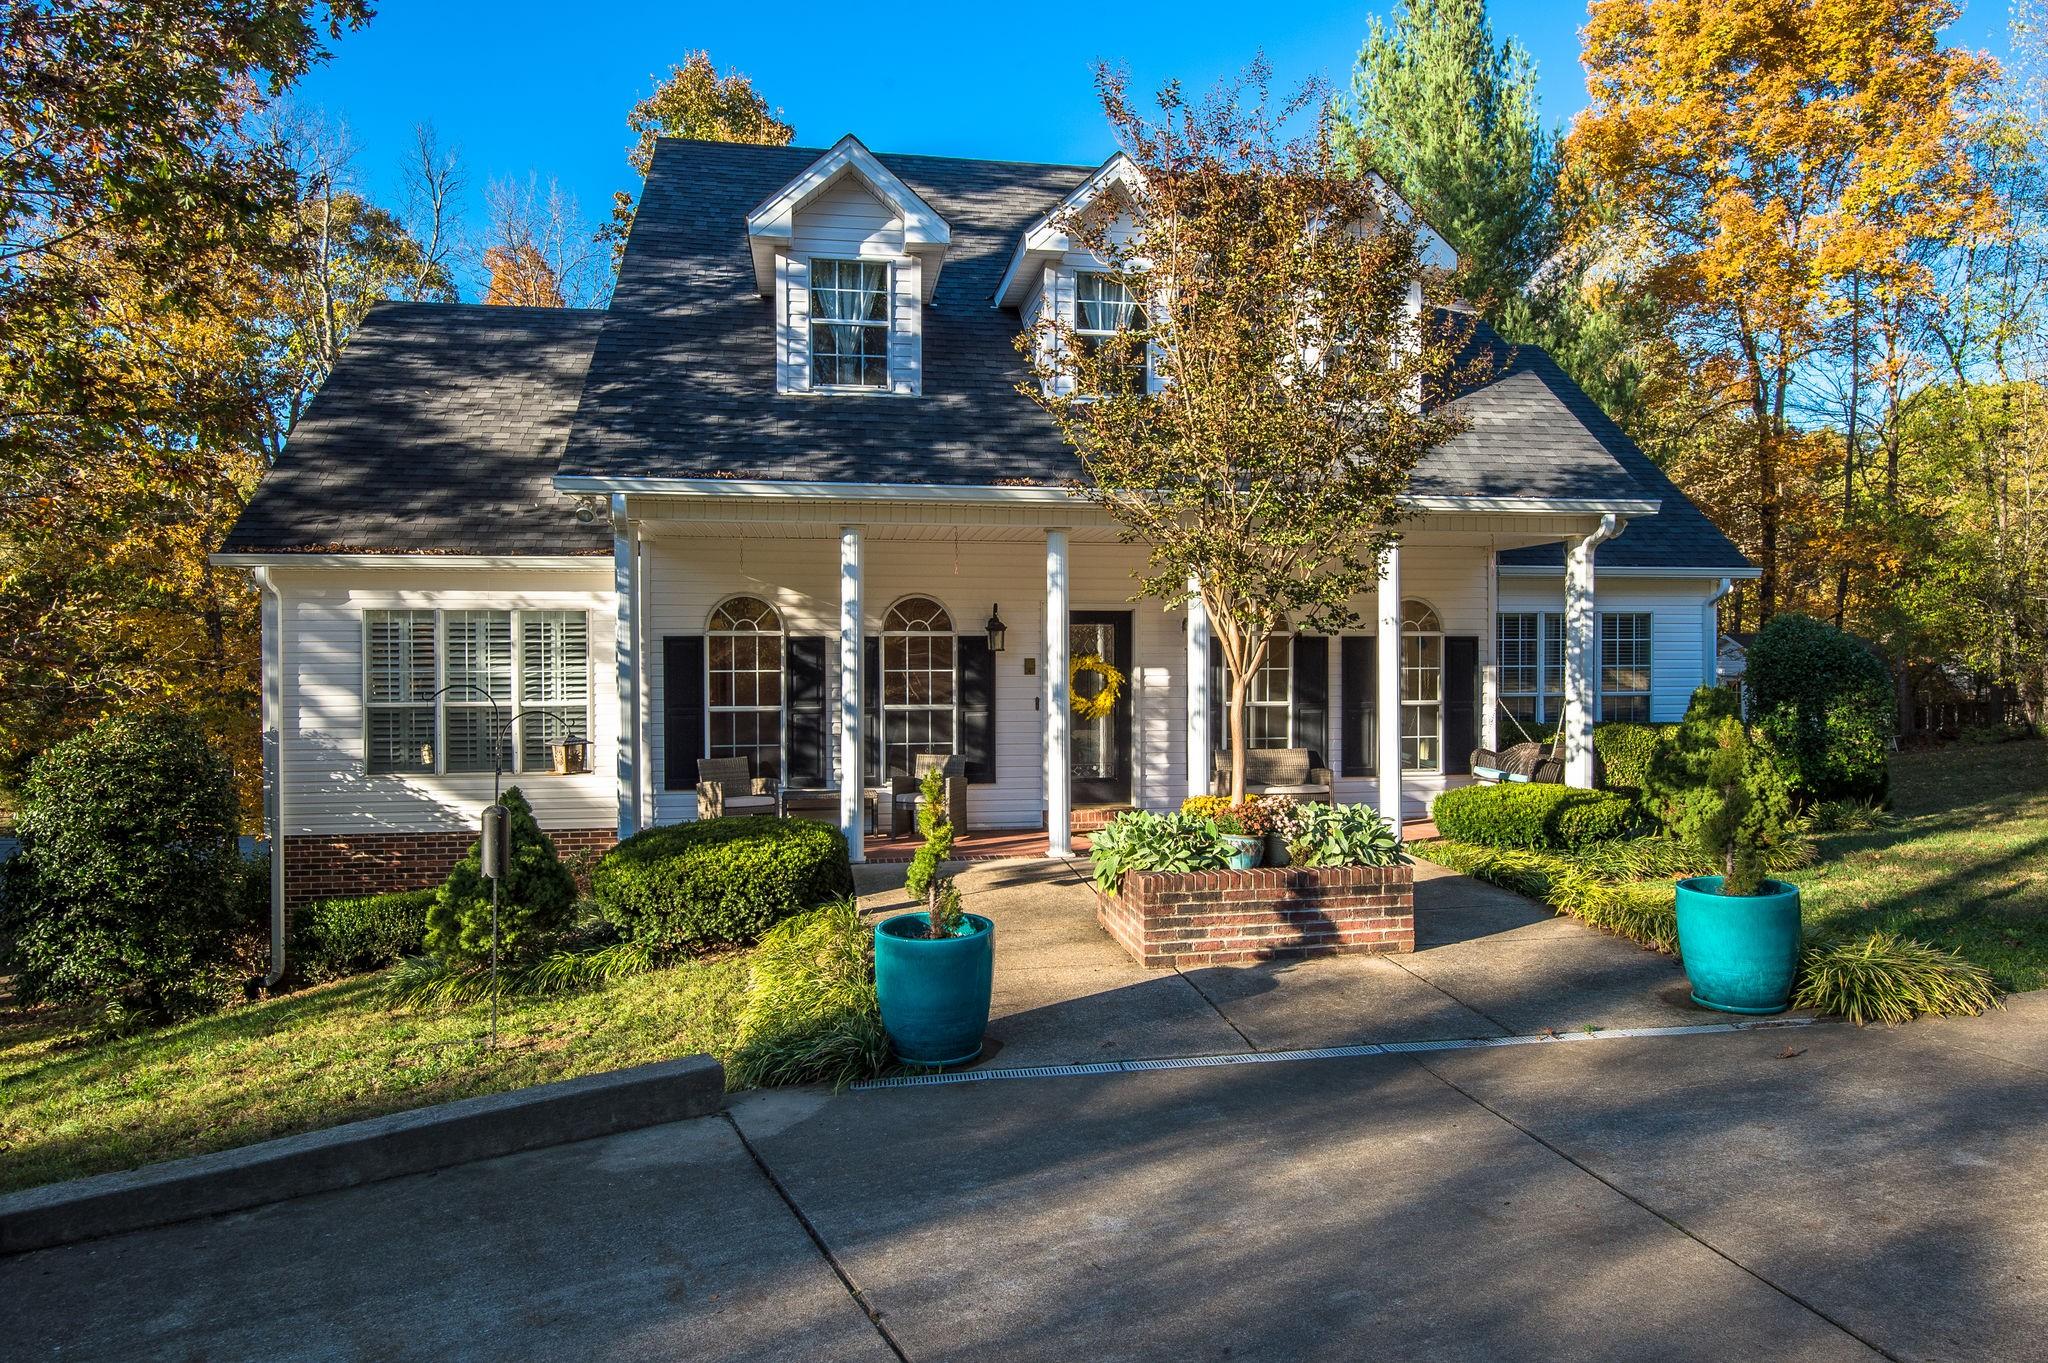 1424 Deerwood Dr, Burns, TN 37029 - Burns, TN real estate listing